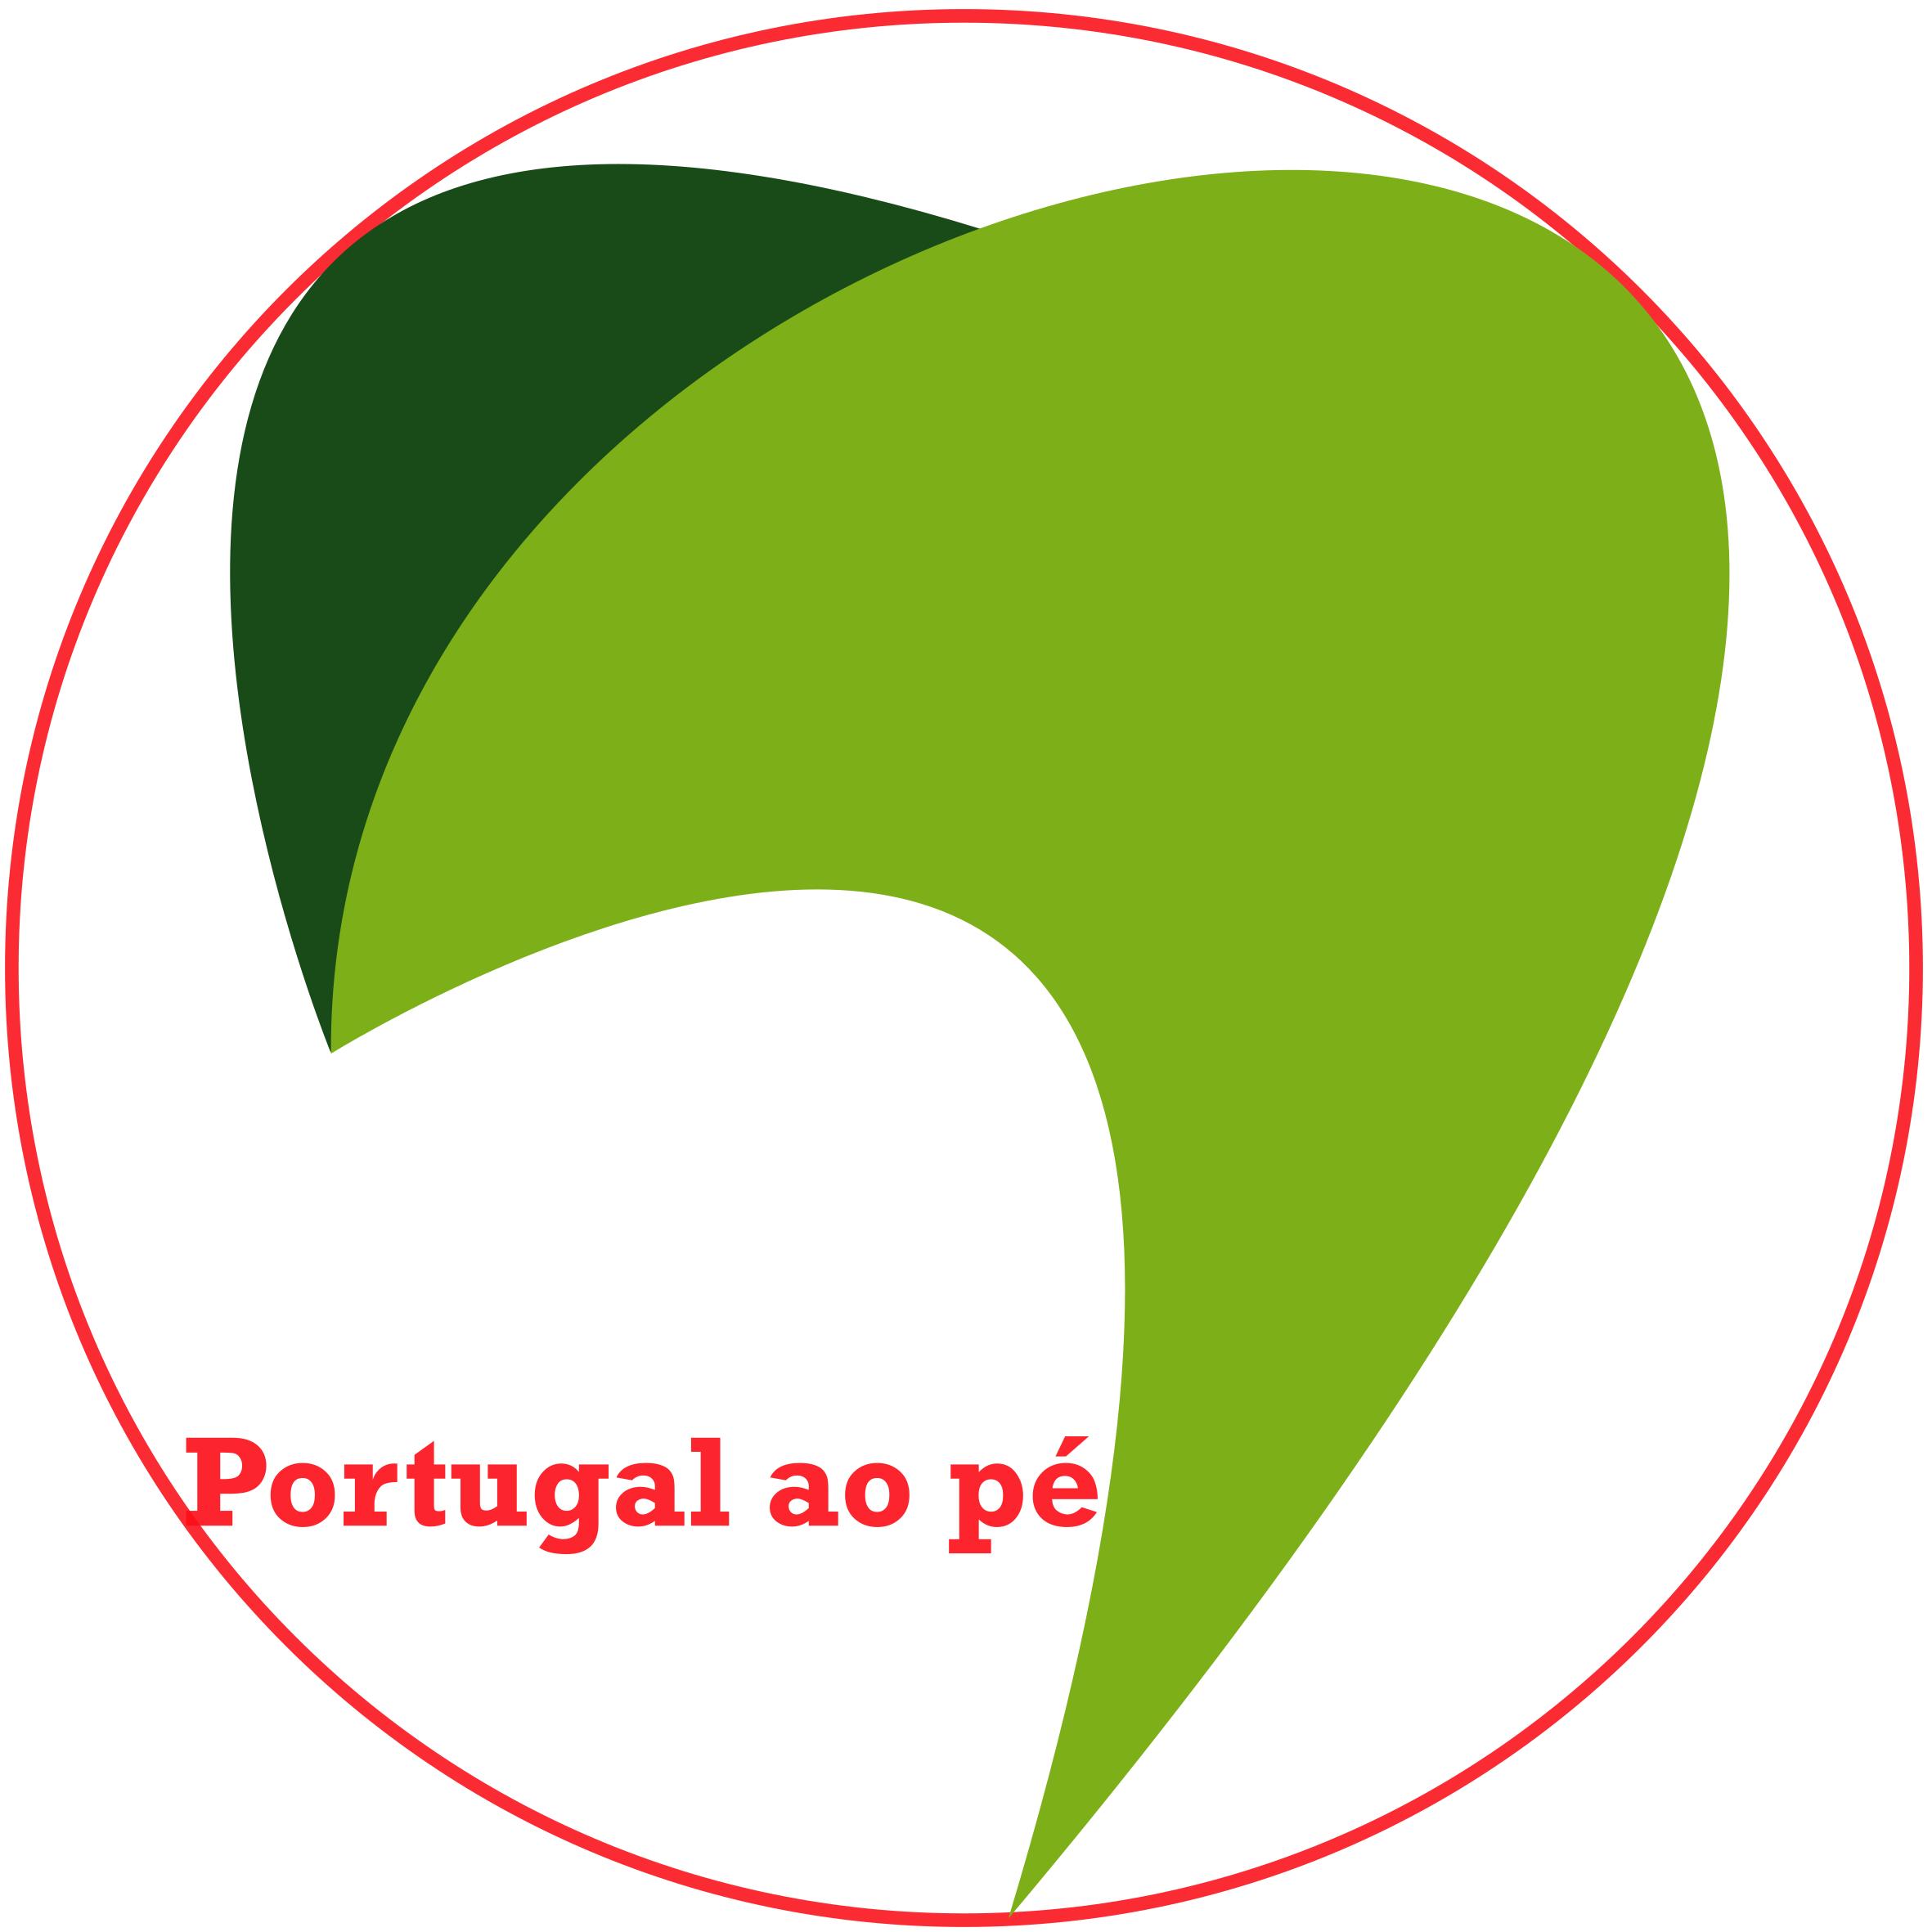 PortugalaoPe-Logo